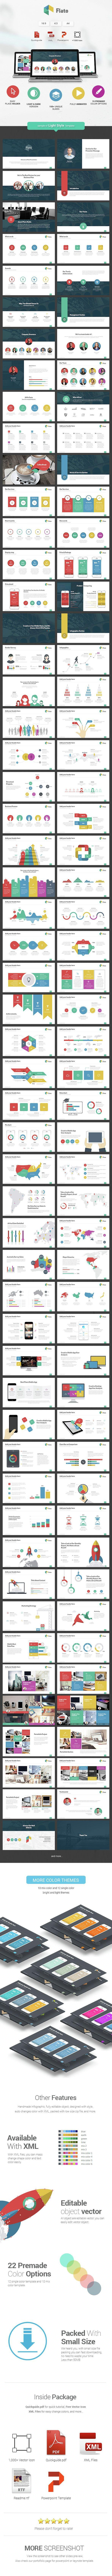 Flato - Powerpoint Presentation Template #slides Download here: http://graphicriver.net/item/flato-powerpoint-template/14593329?ref=ksioks